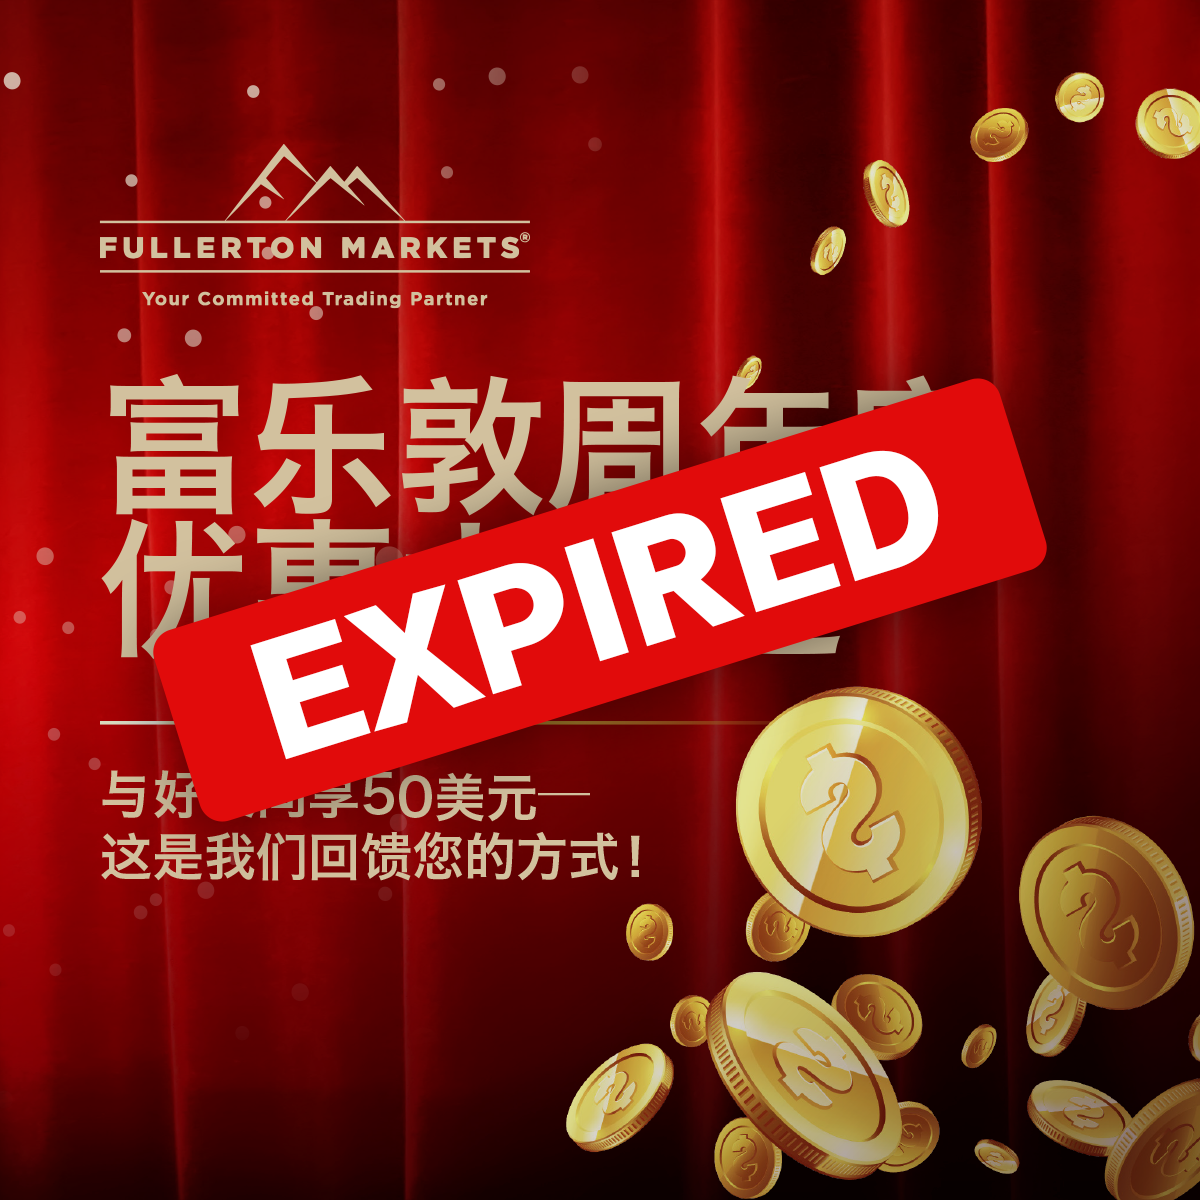 Fullerton_s-Big-Birthday-Payout_1200x1200px-(2)